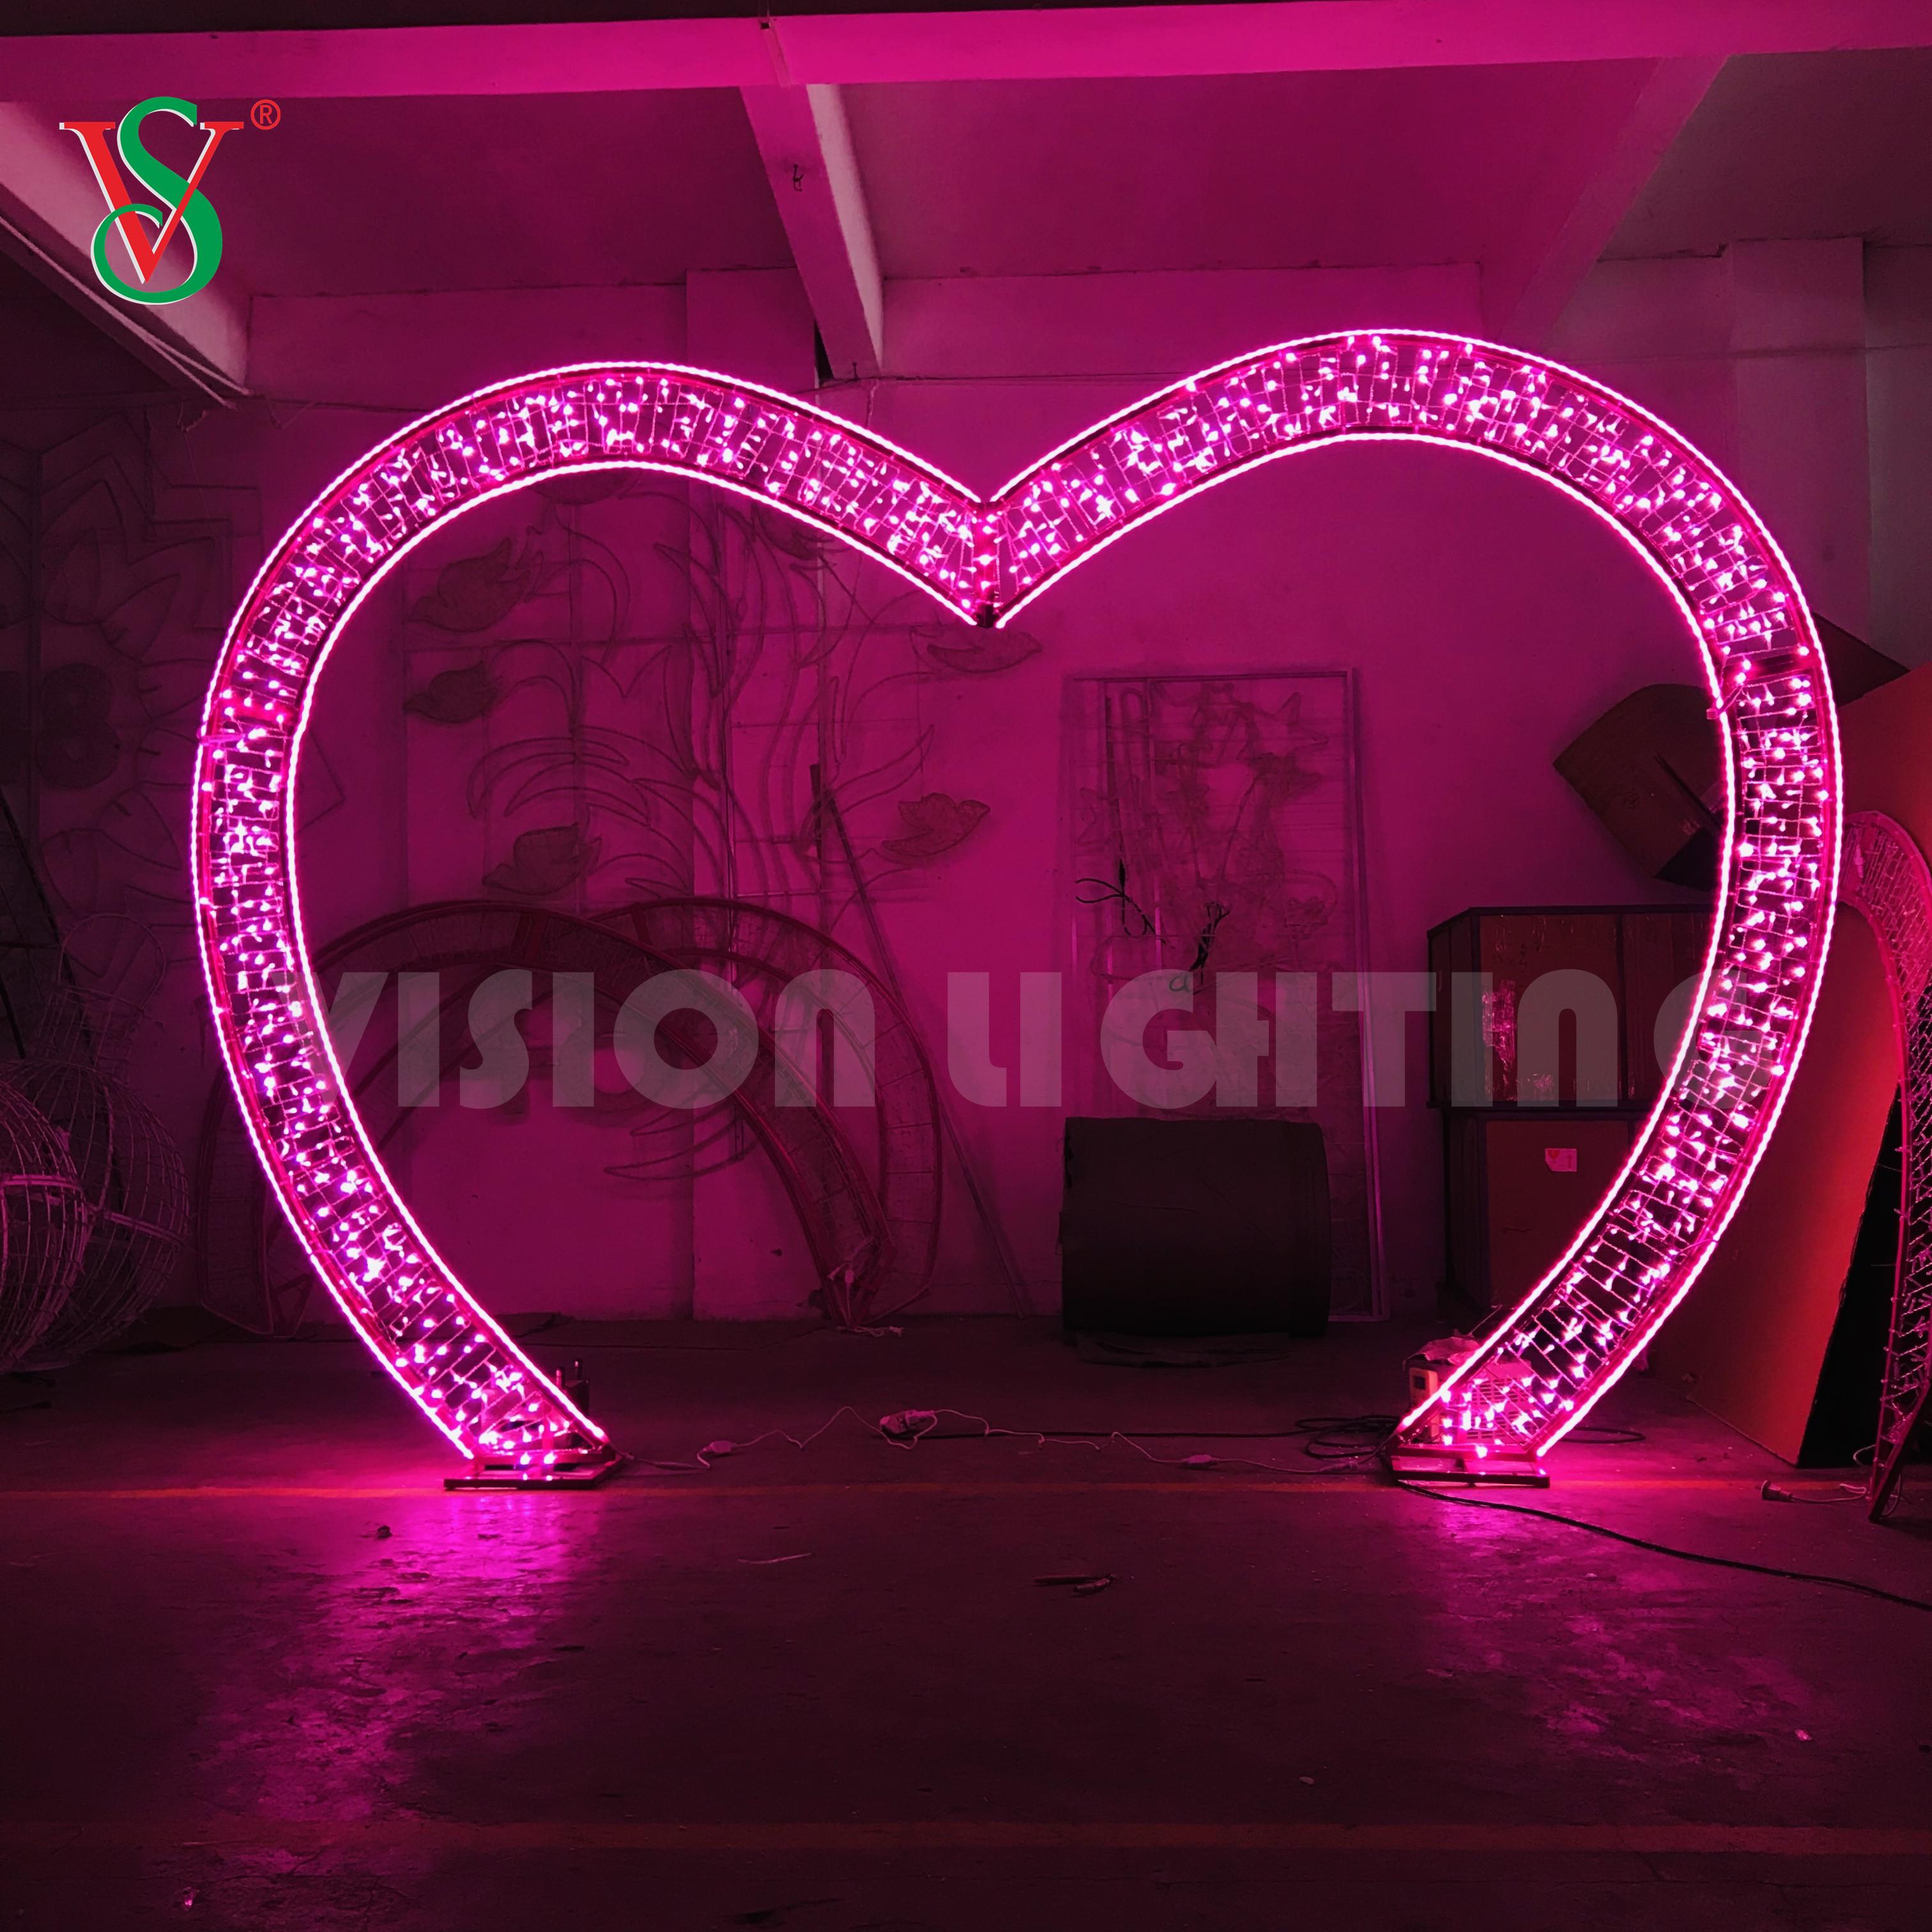 2D Pasillo Romantico Corazon Iluminacion con Motivos Decoracion LED Luces para Valentin y la Boda